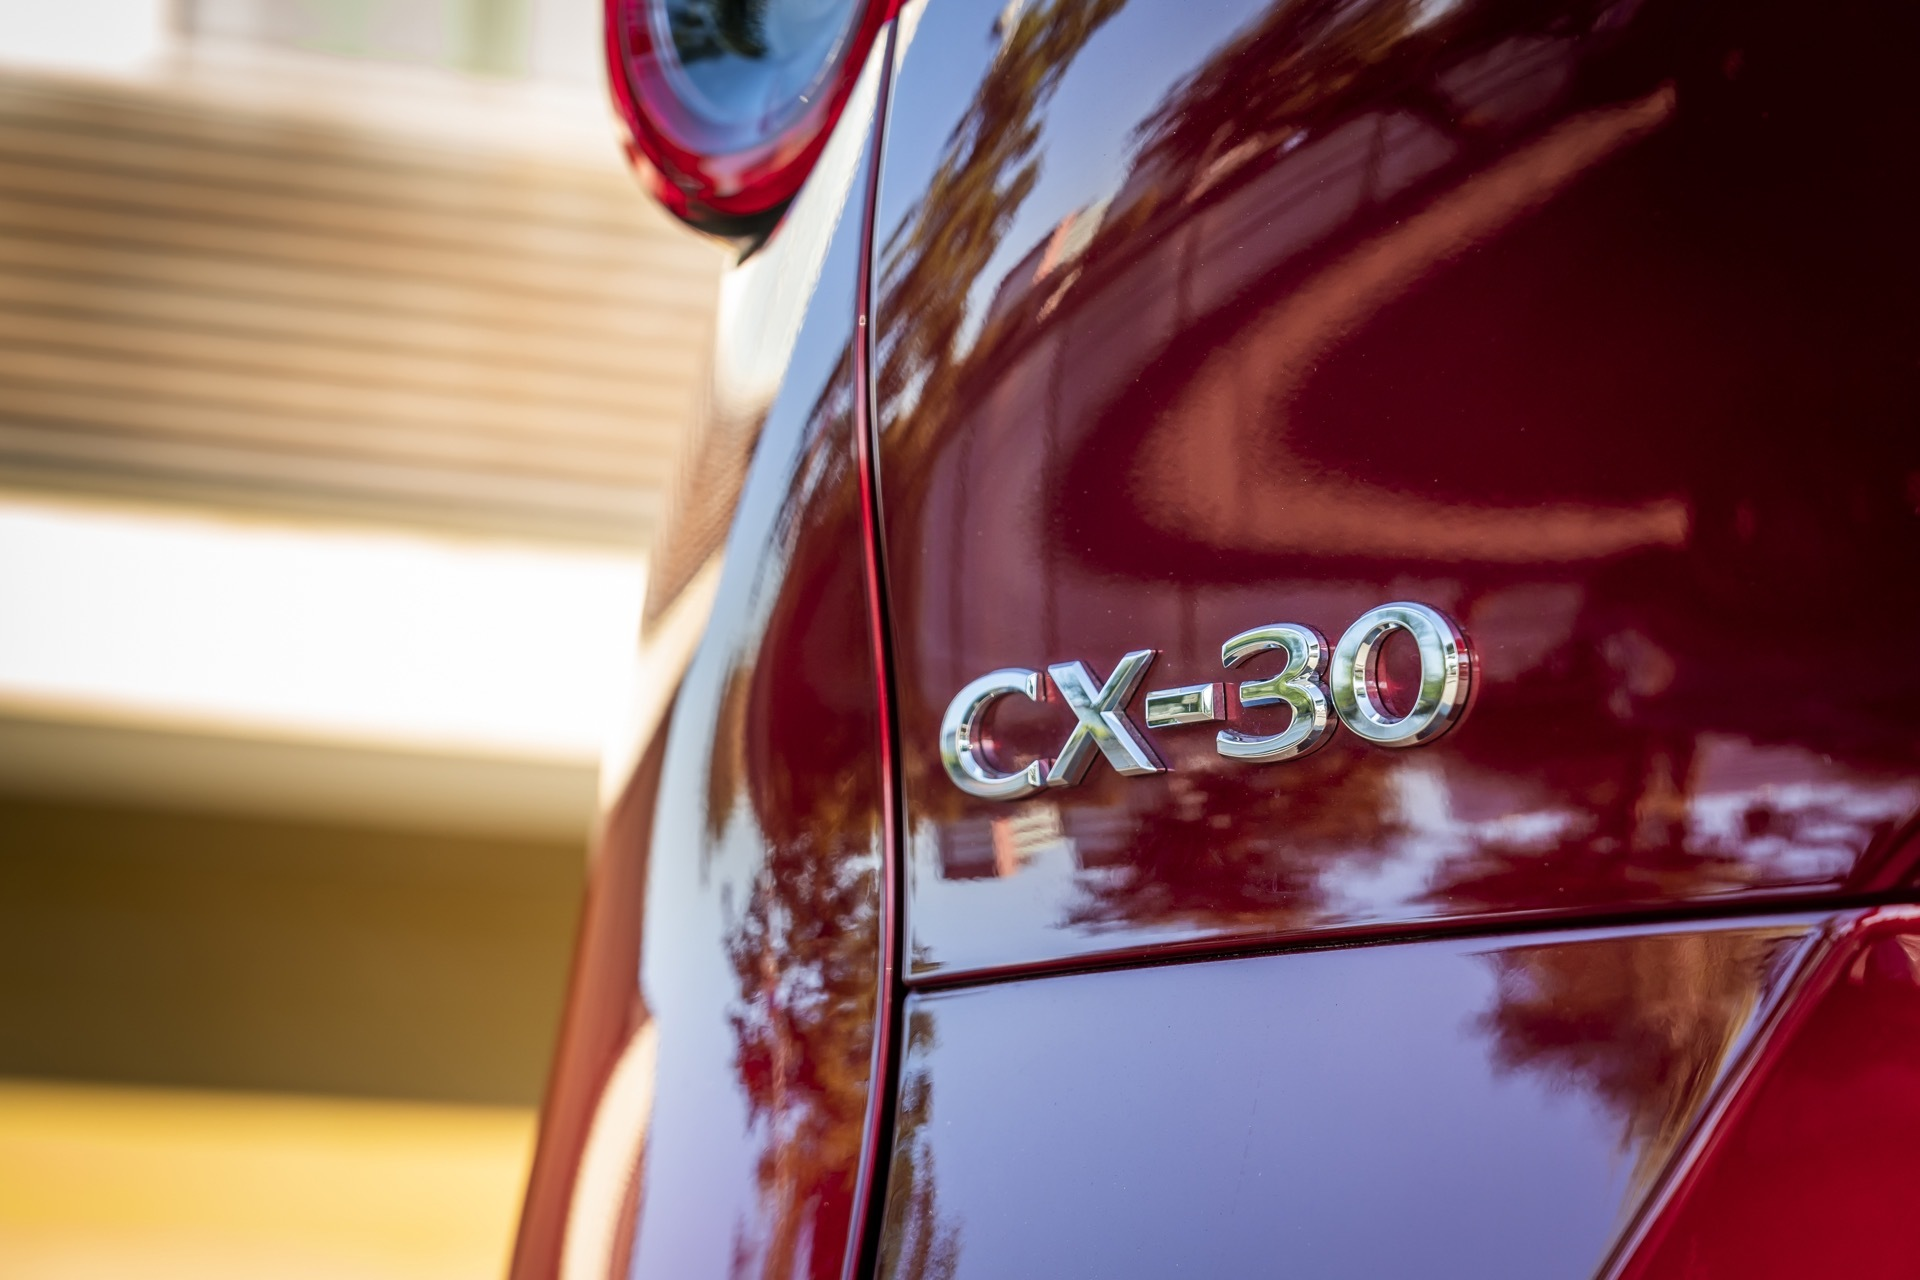 Mazda Cx 30 Detalle 00001